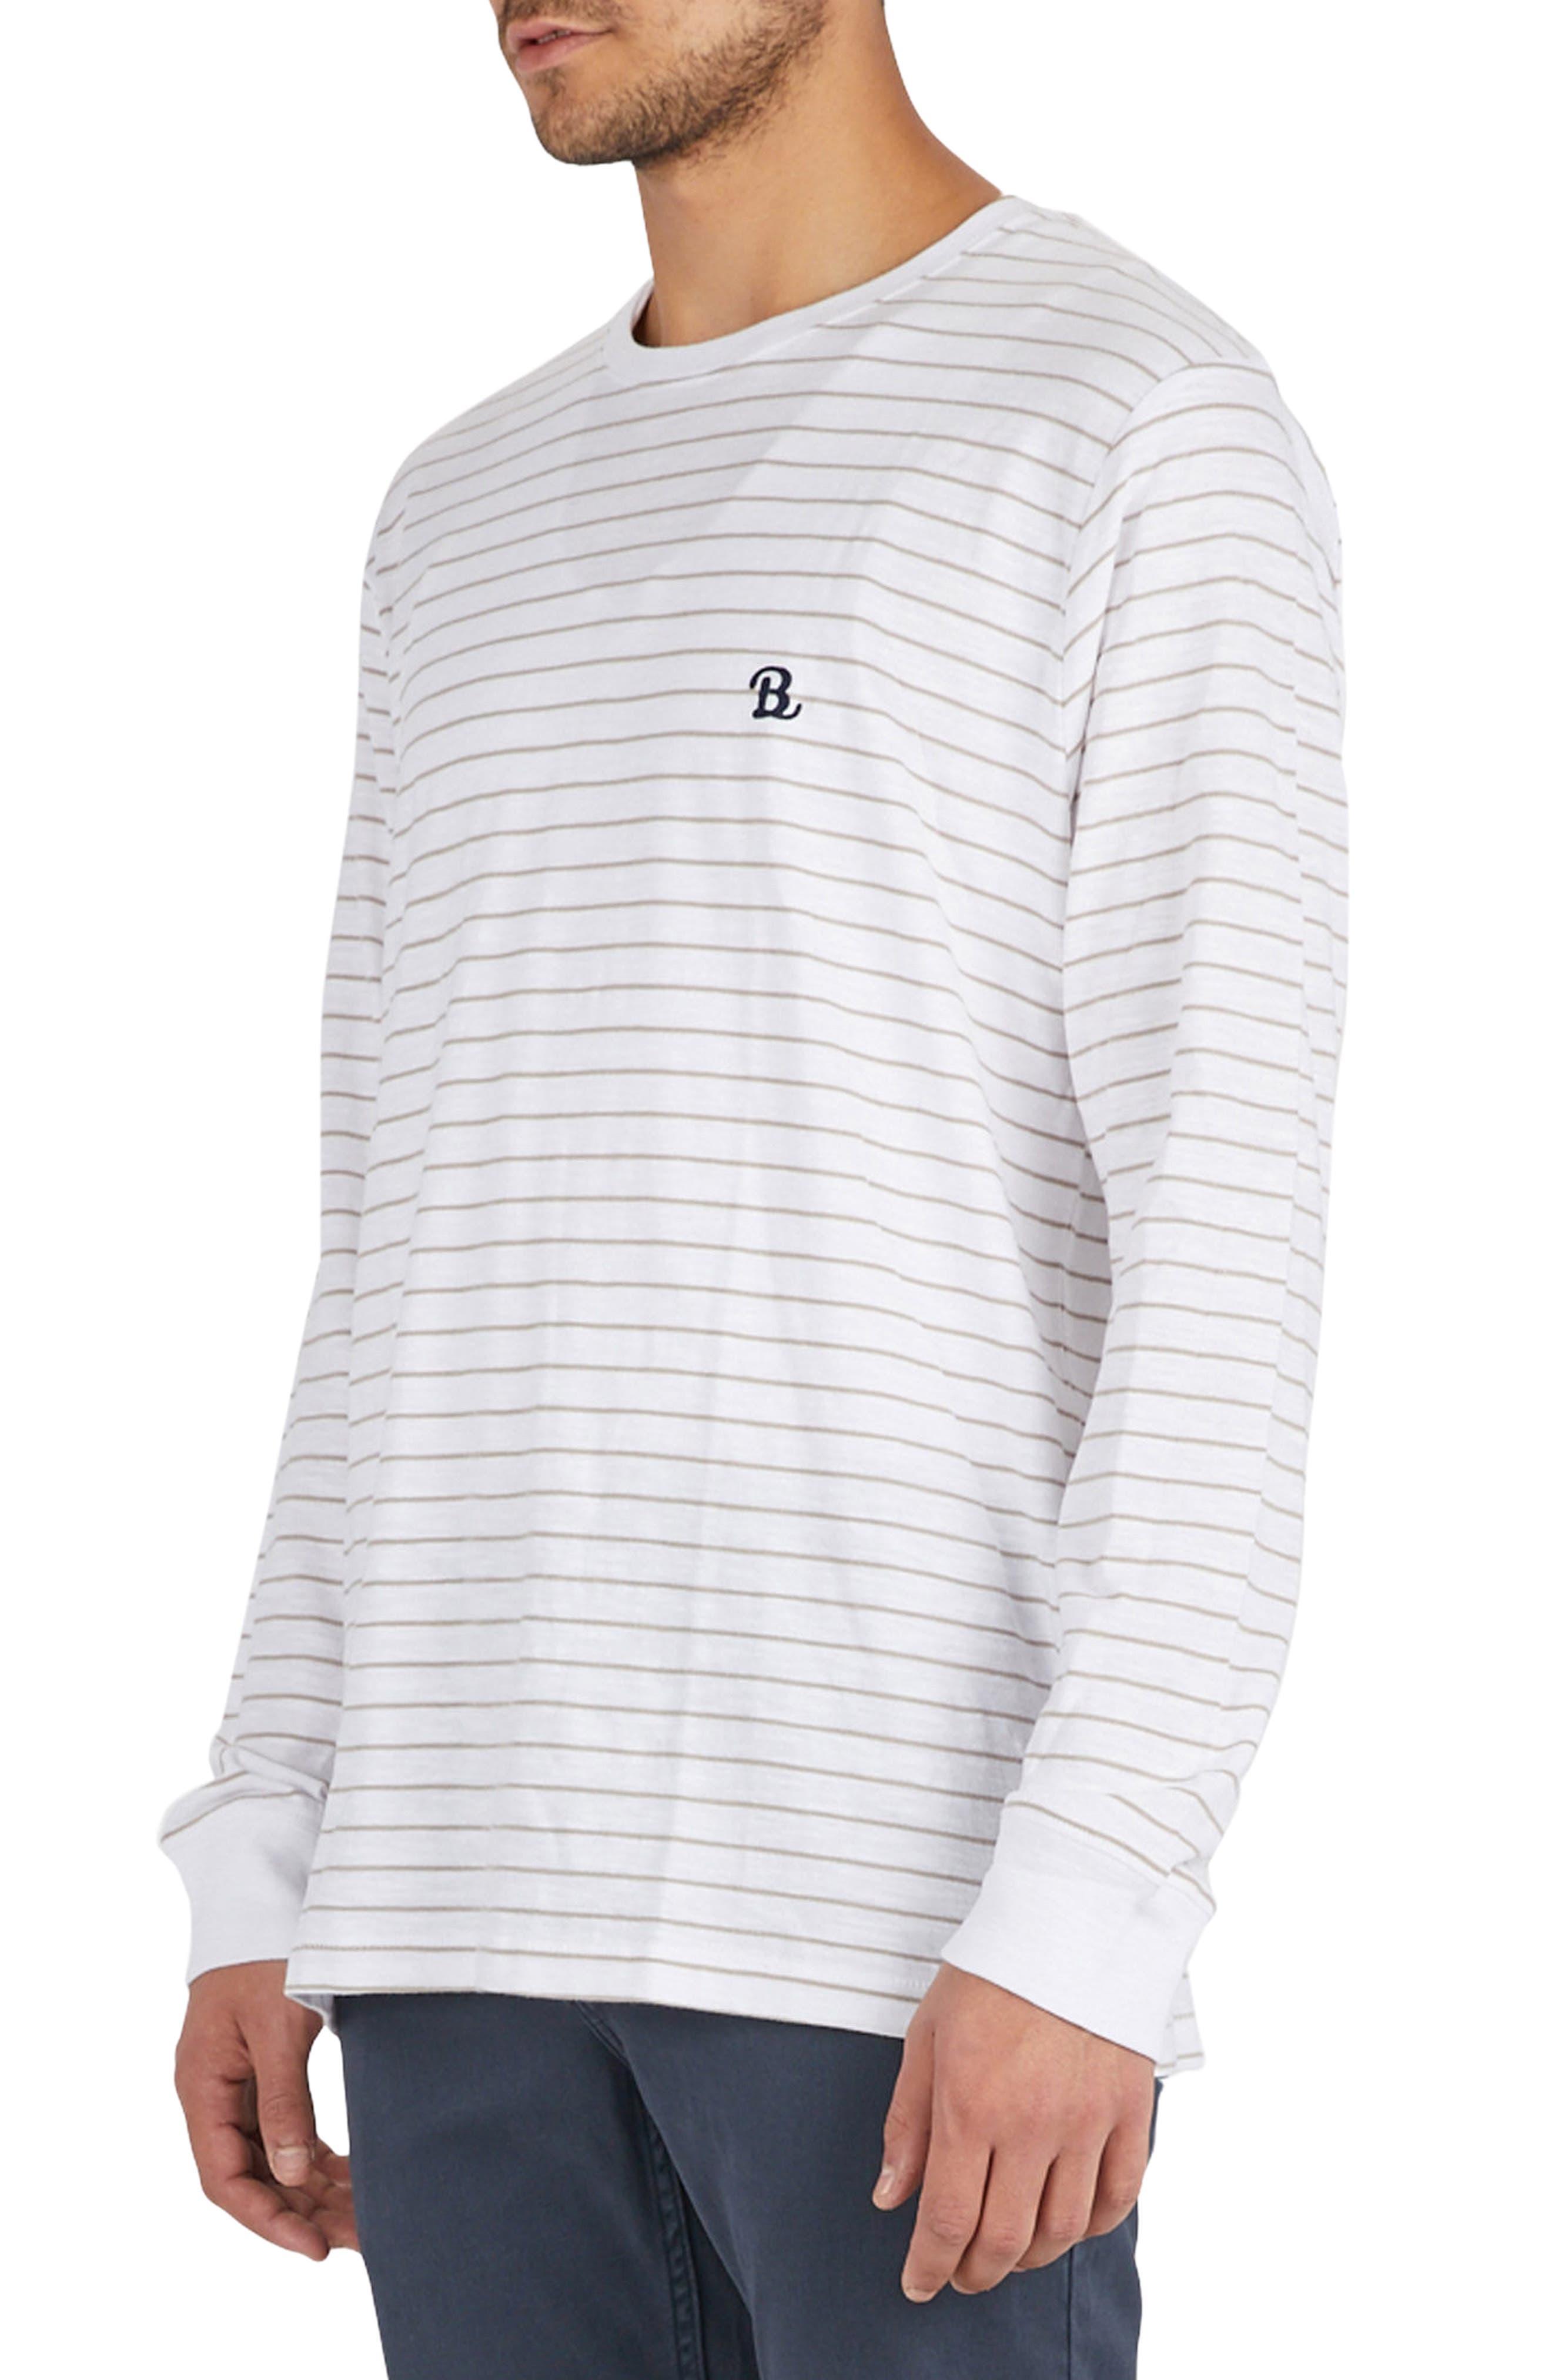 B. Schooled T-Shirt,                             Alternate thumbnail 4, color,                             Beige Stripe